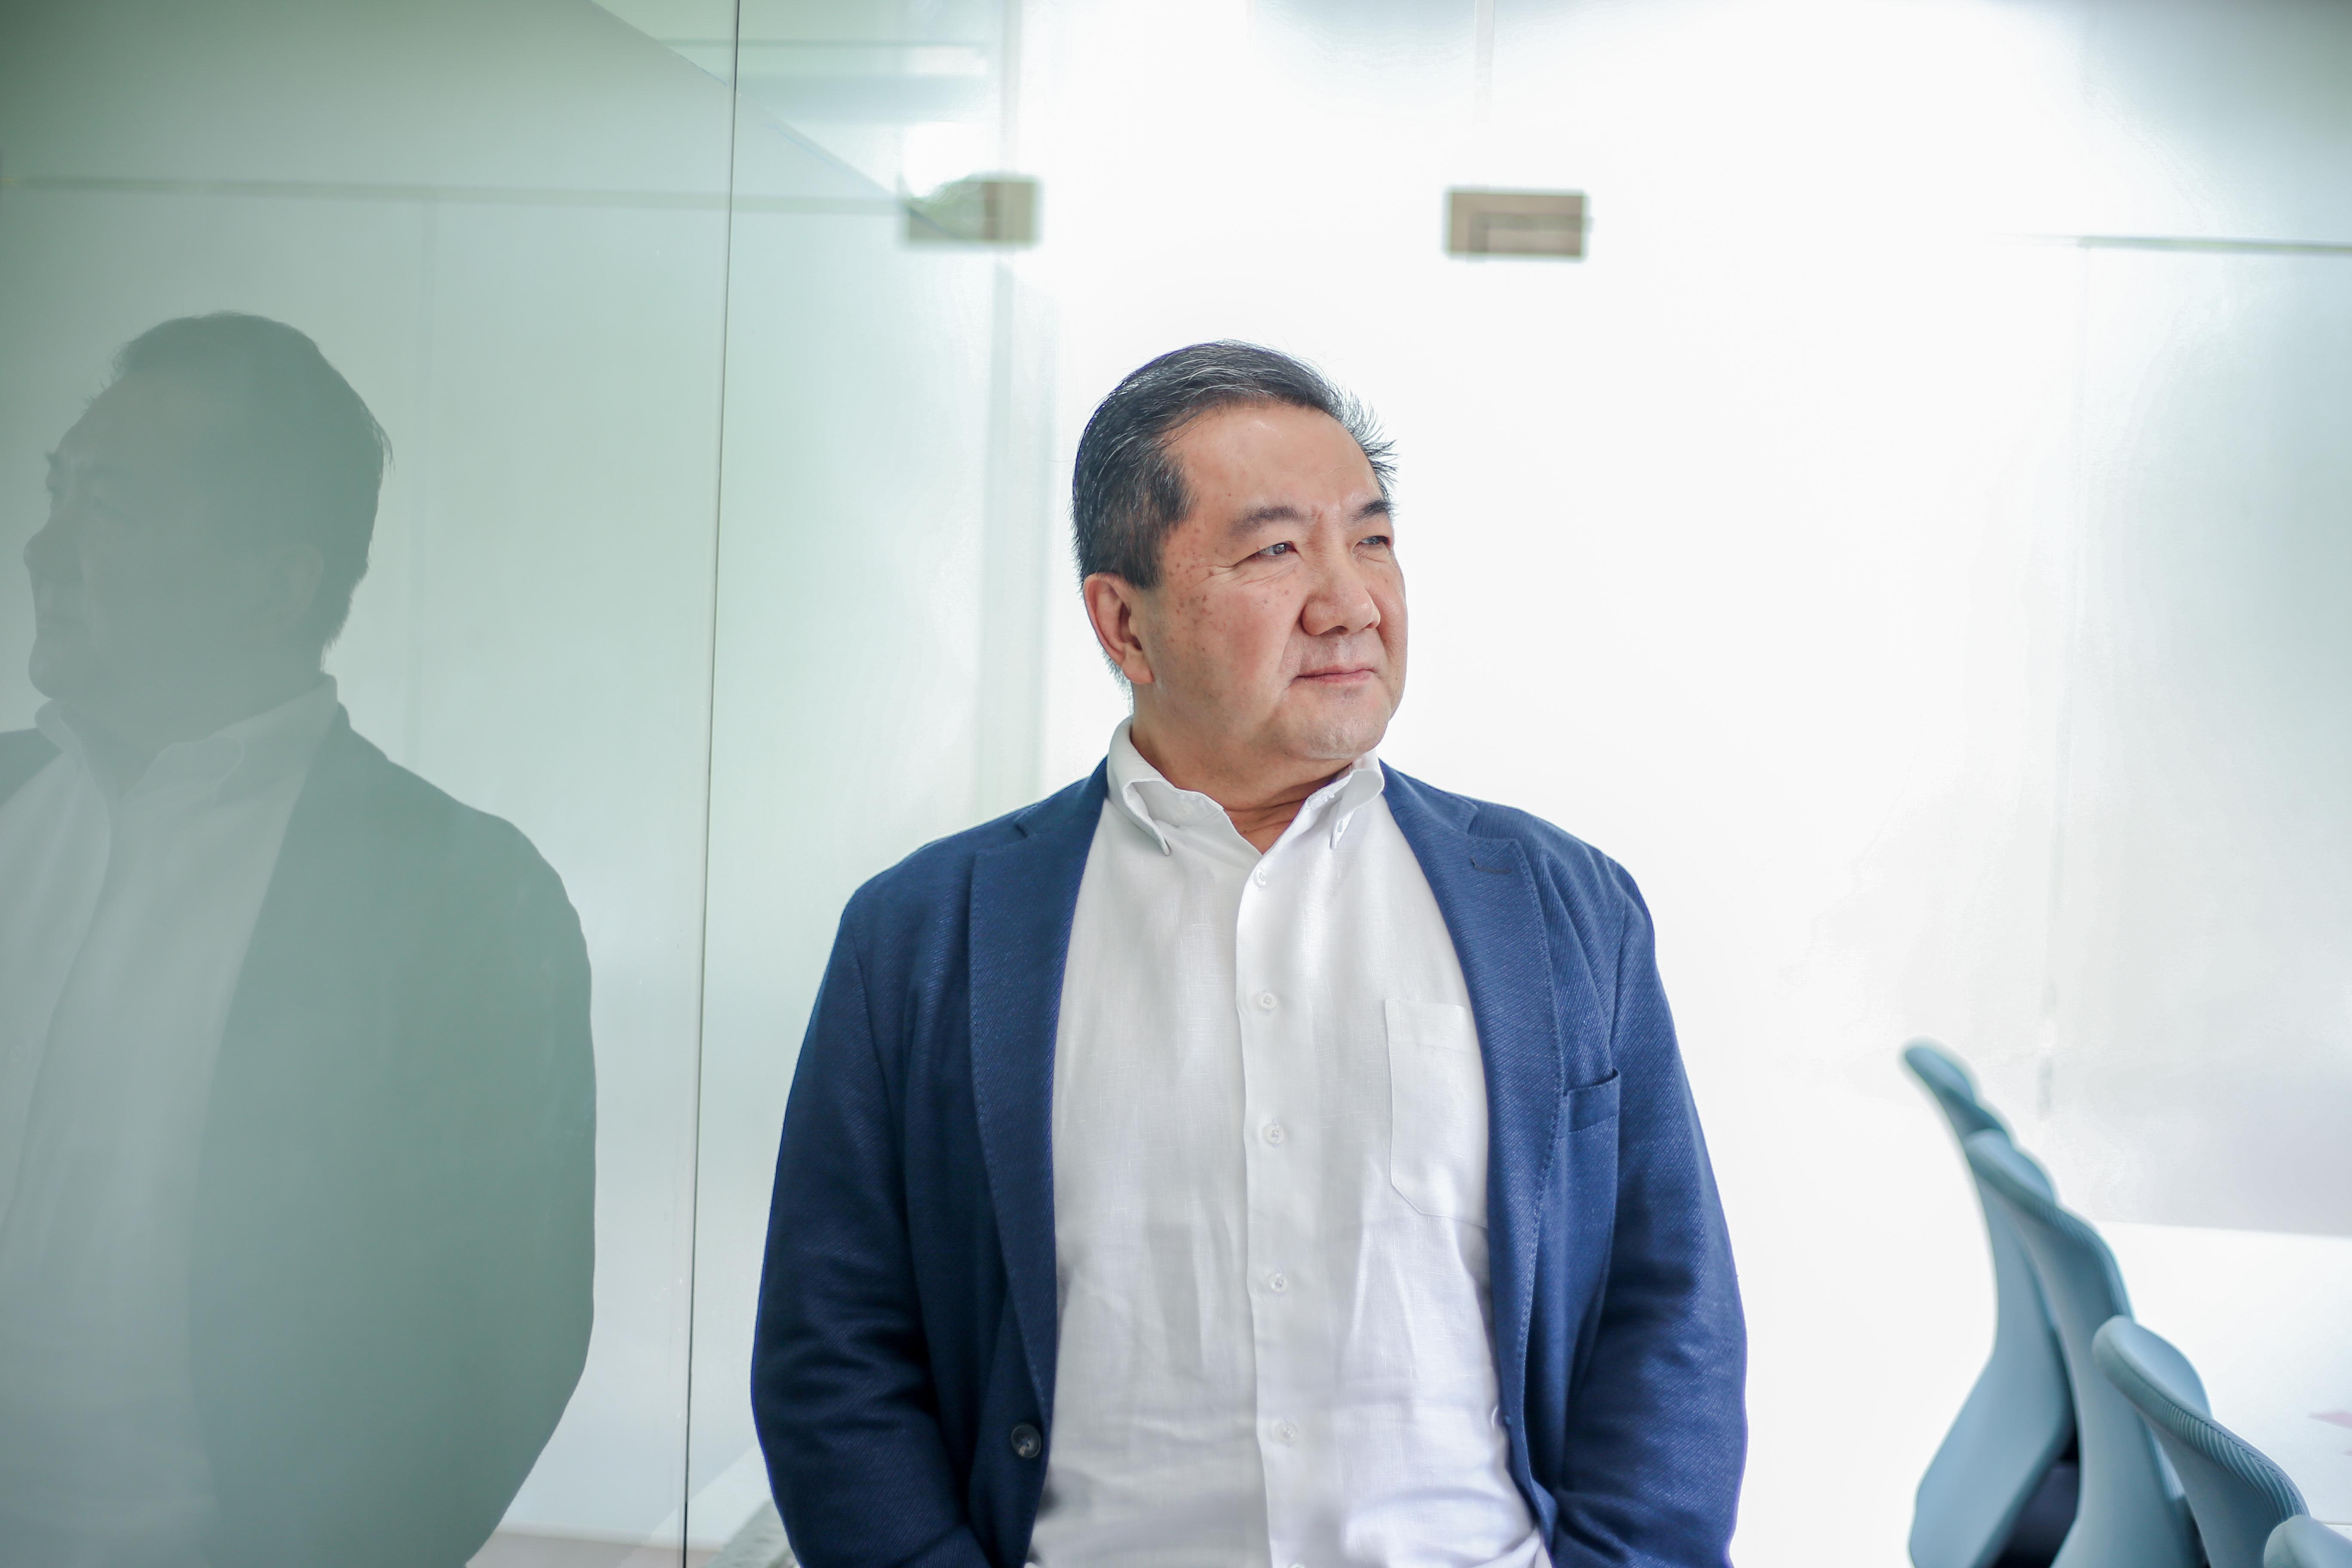 Indonesian B2B marketplace GudangAda raises more than 0M in new funding